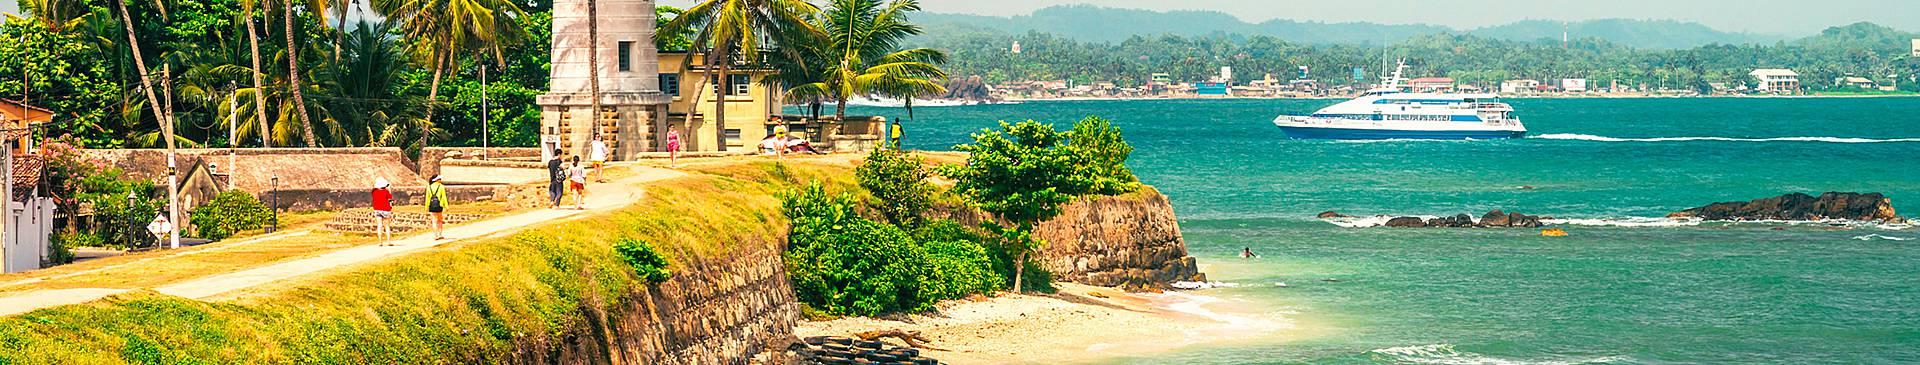 Voyage plage au Sri Lanka